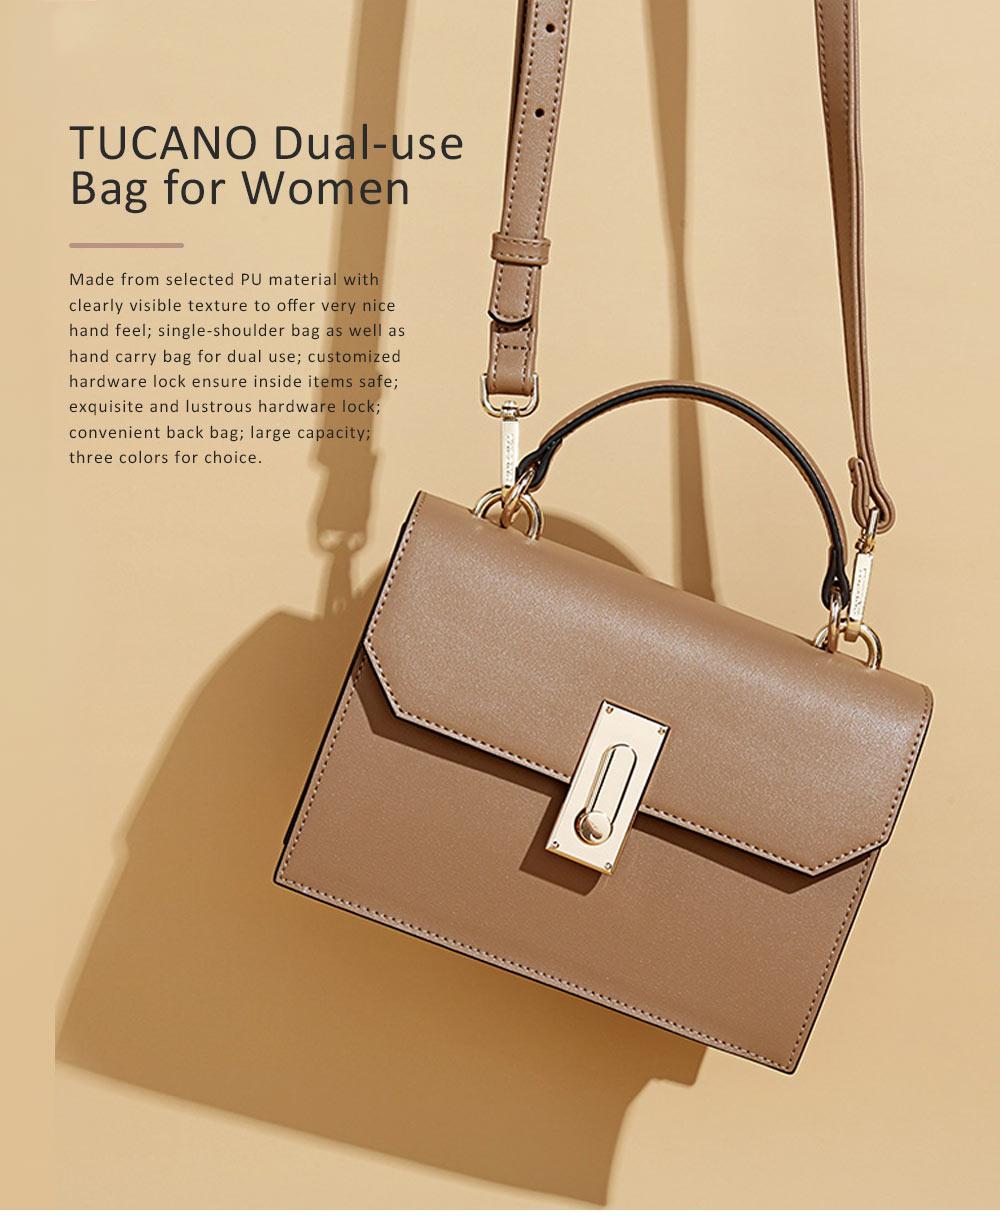 TUCANO New Style Handbag for Women, Fashionable Square Messenger Bag for Women Single-shoulder Bag 0